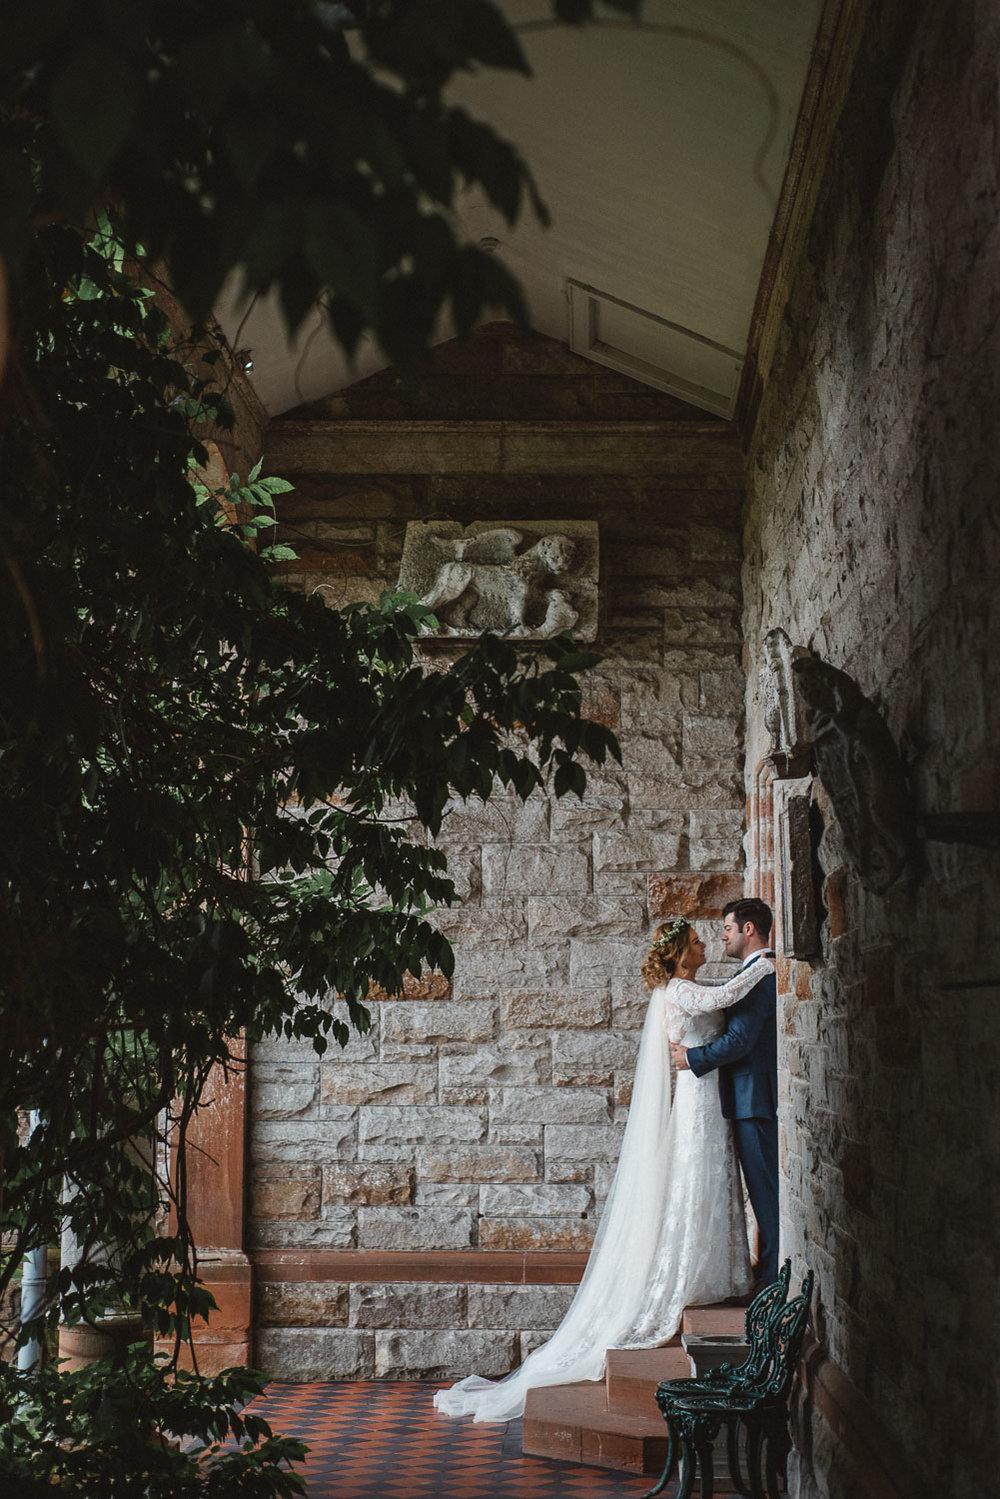 Brode and groom stand in a pocket of light Castle Leslie Wedding.